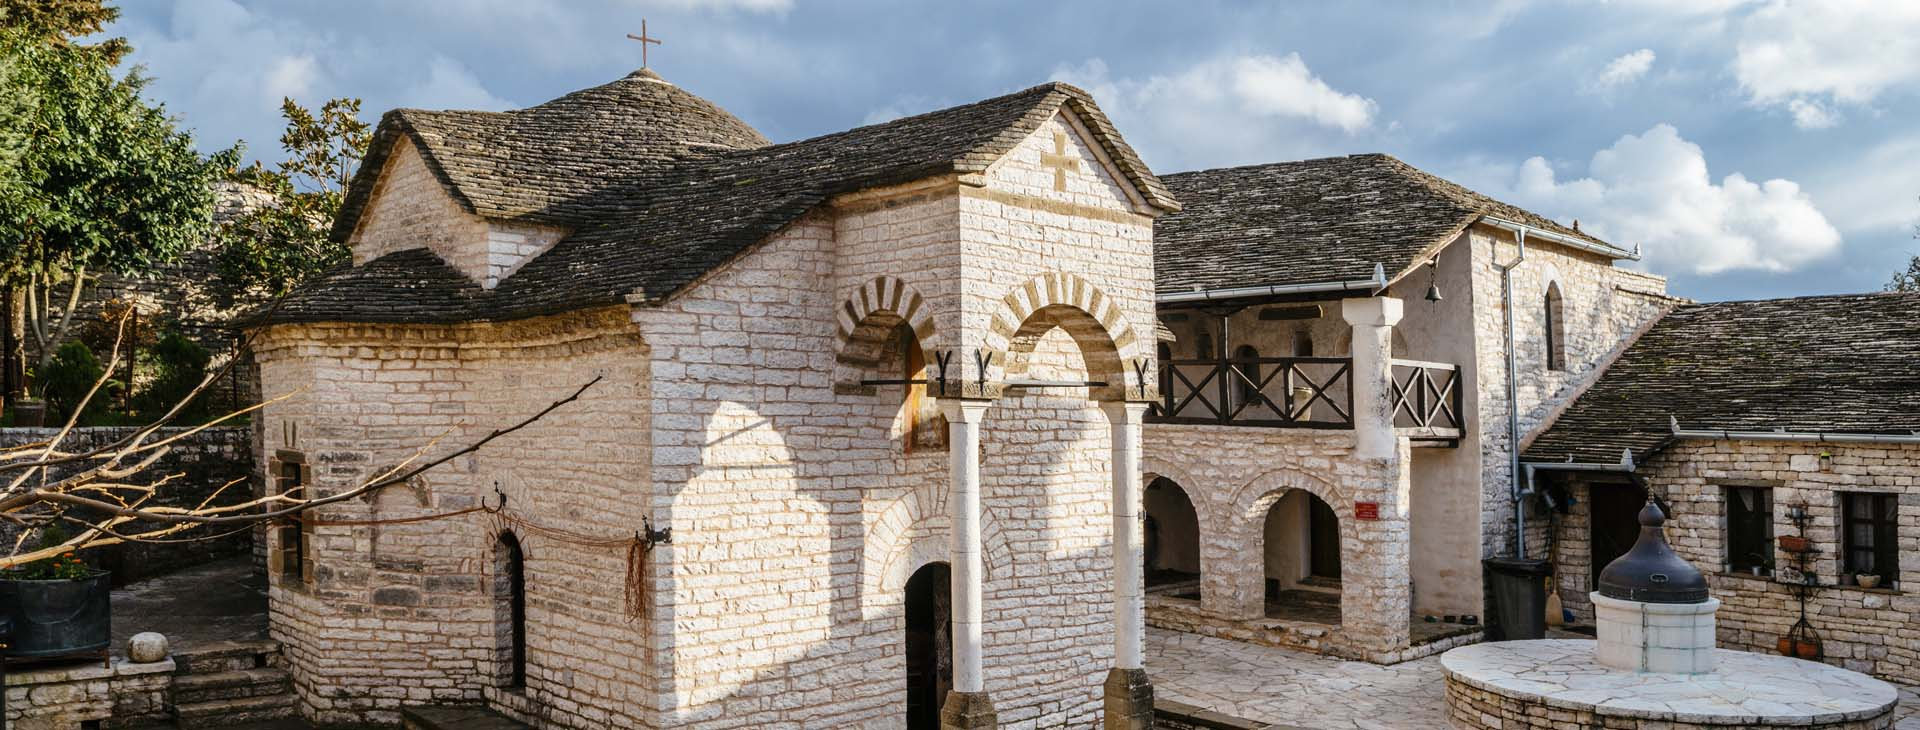 Monastery of Tsouka, Ioannina